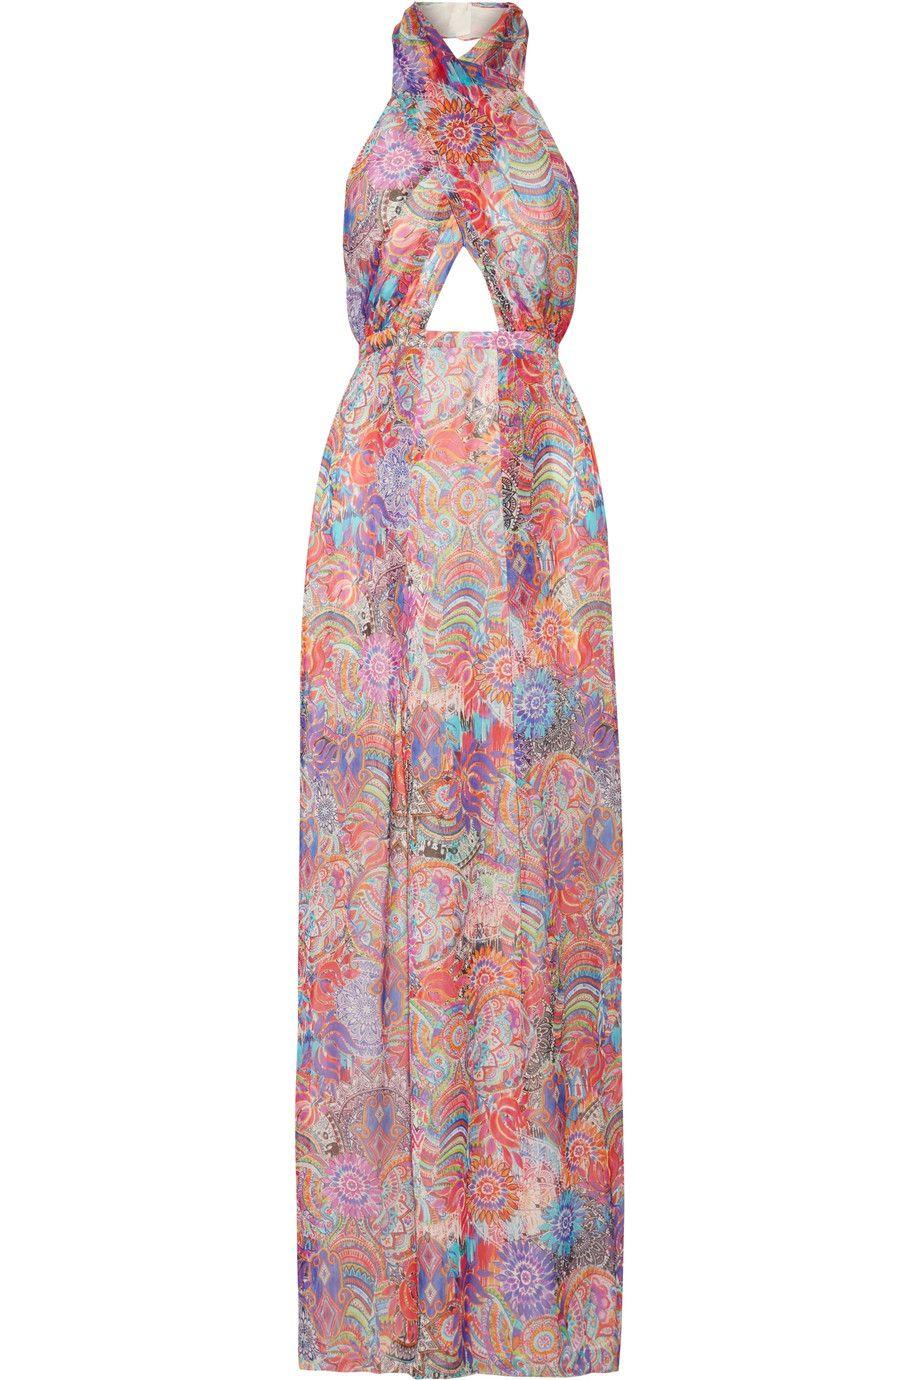 Matthew Williamson Woman Wrap-effect Printed Silk-chiffon Gown Mint Size 8 Matthew Williamson 0pUWFKdw7v